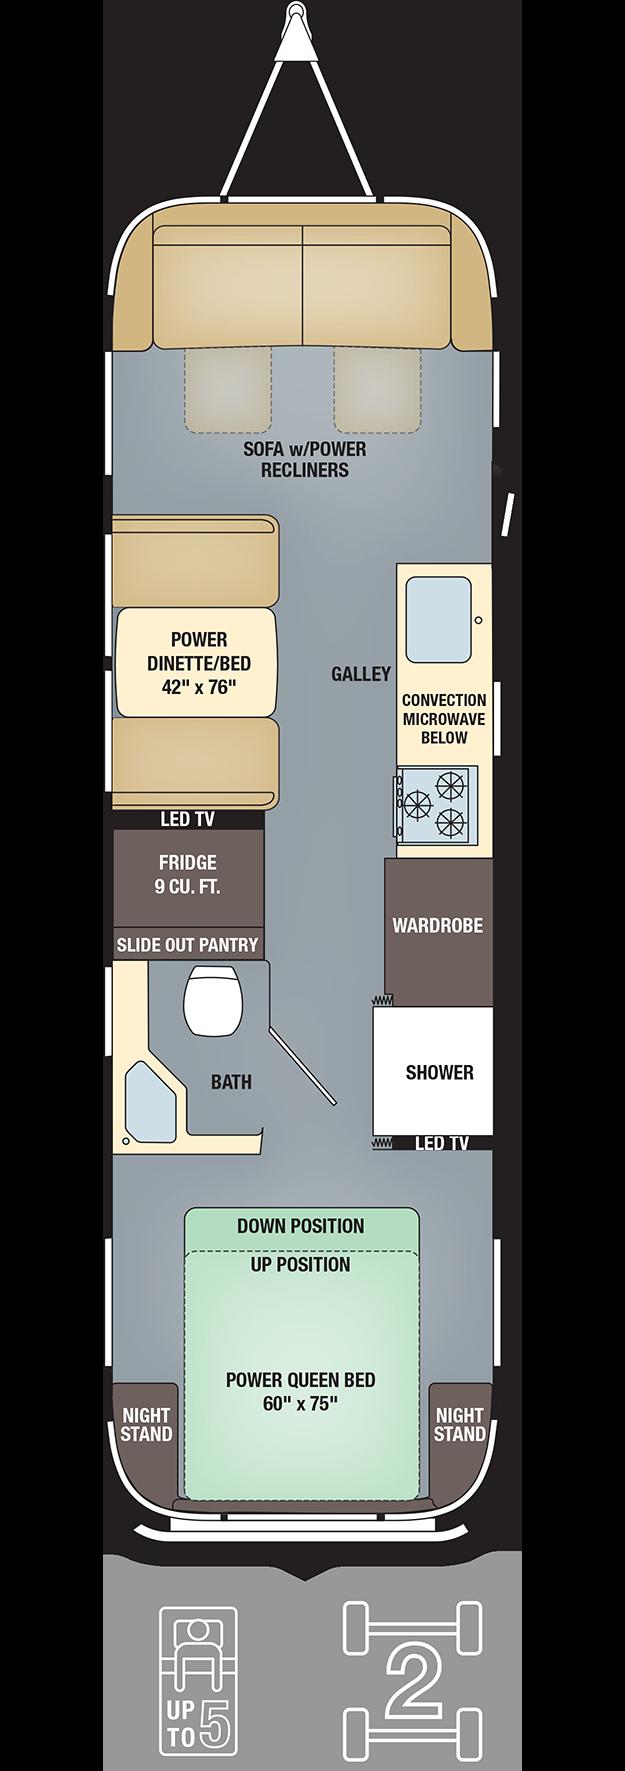 Floor Plans Classic 30 Airstream Dream Pinterest – 30 Ft Travel Trailer Floor Plans